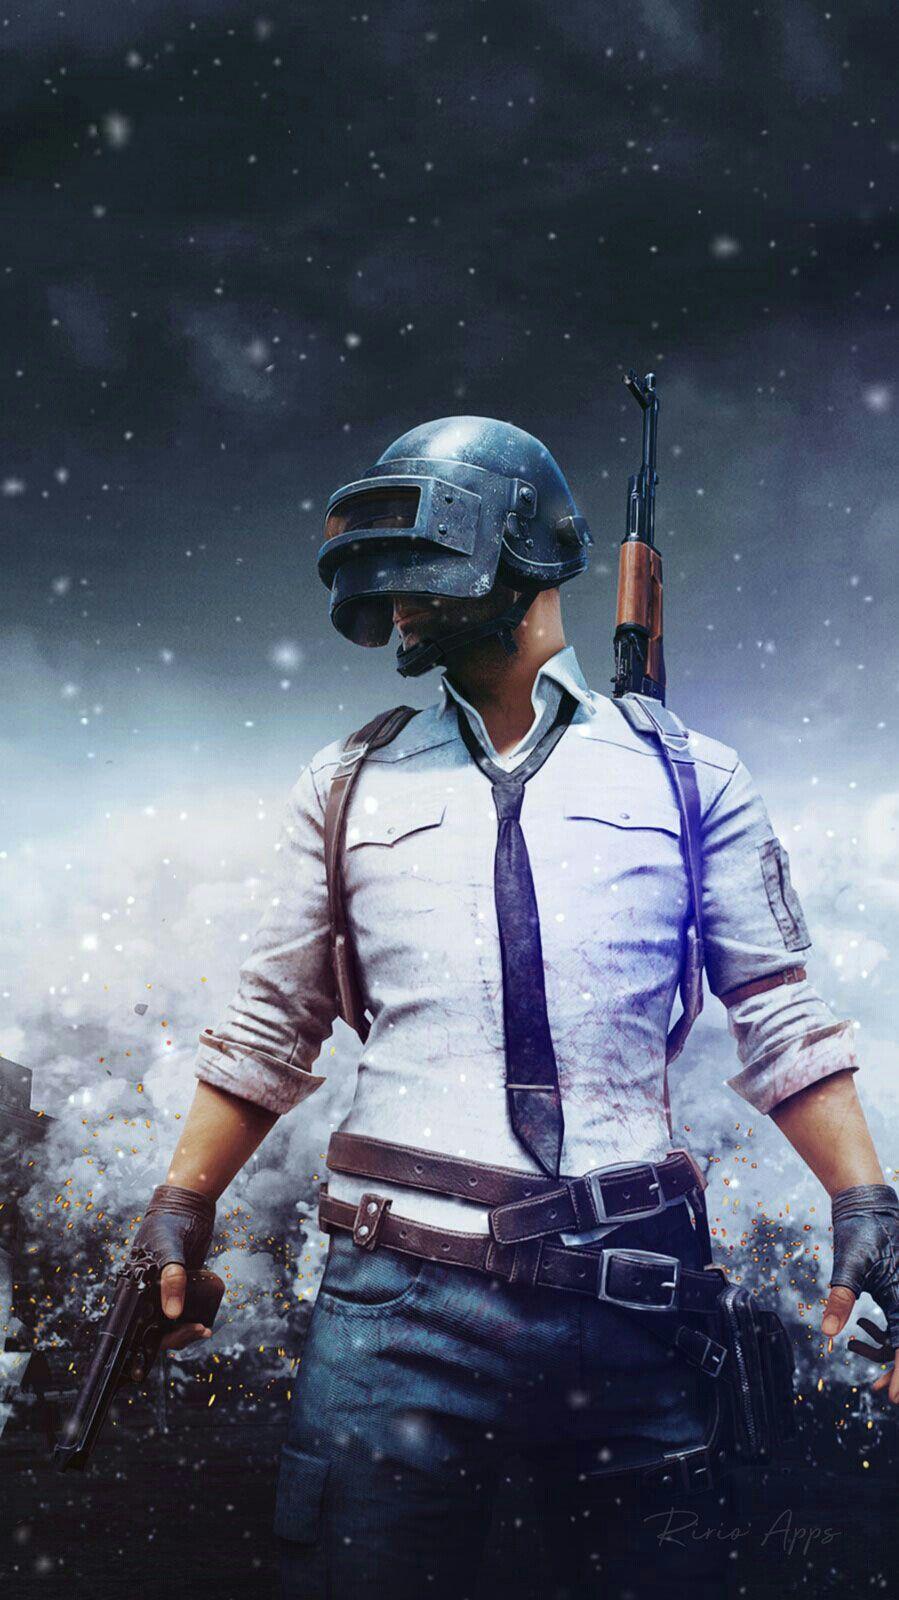 Pin by Баха Мирный on PlayerUnknown's Battlegrounds ...